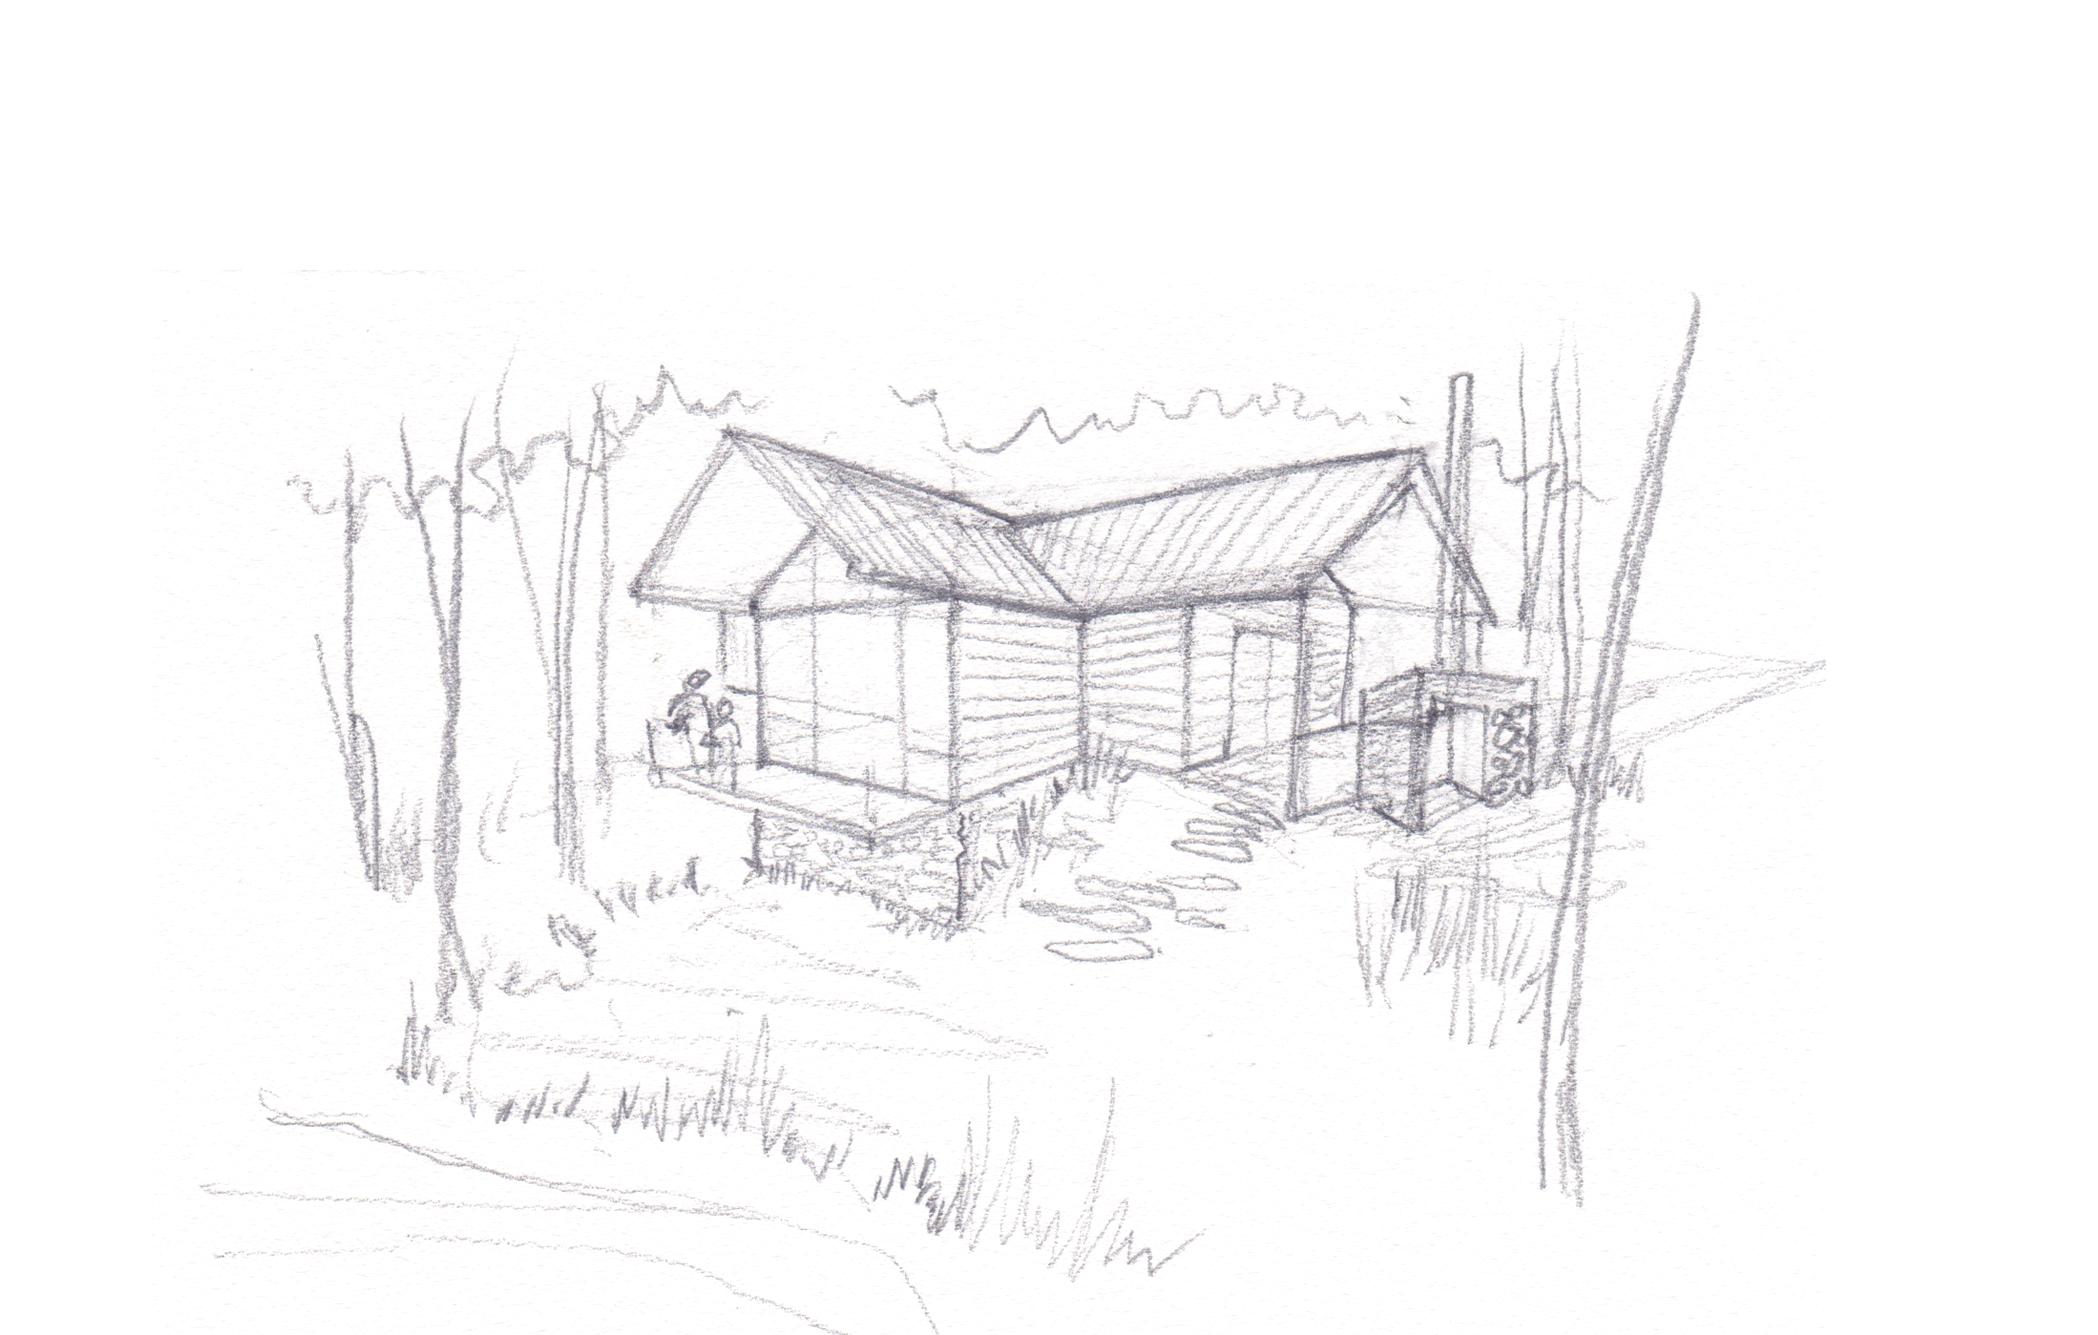 breen sketch.jpg